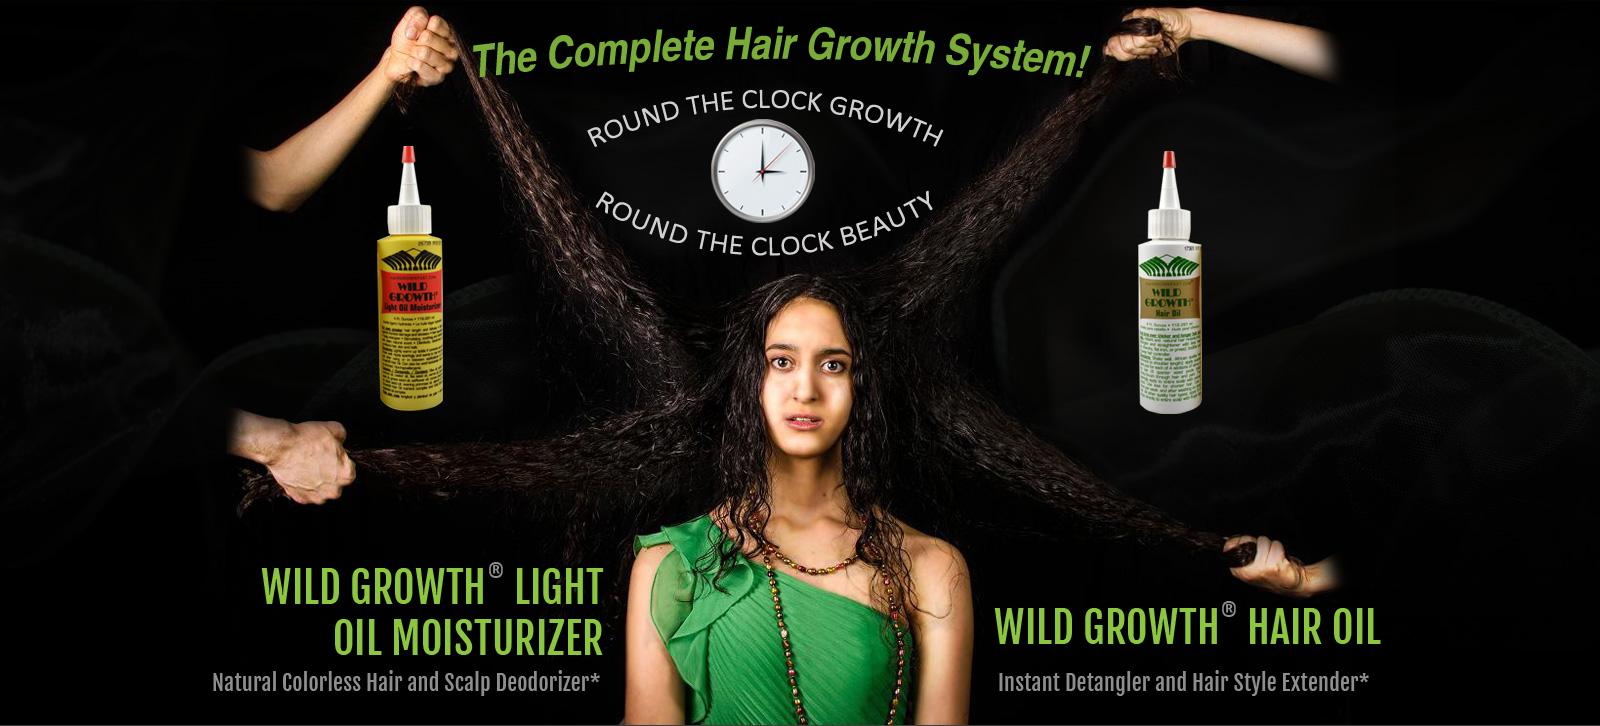 The Complete Hair Growth Sysytem